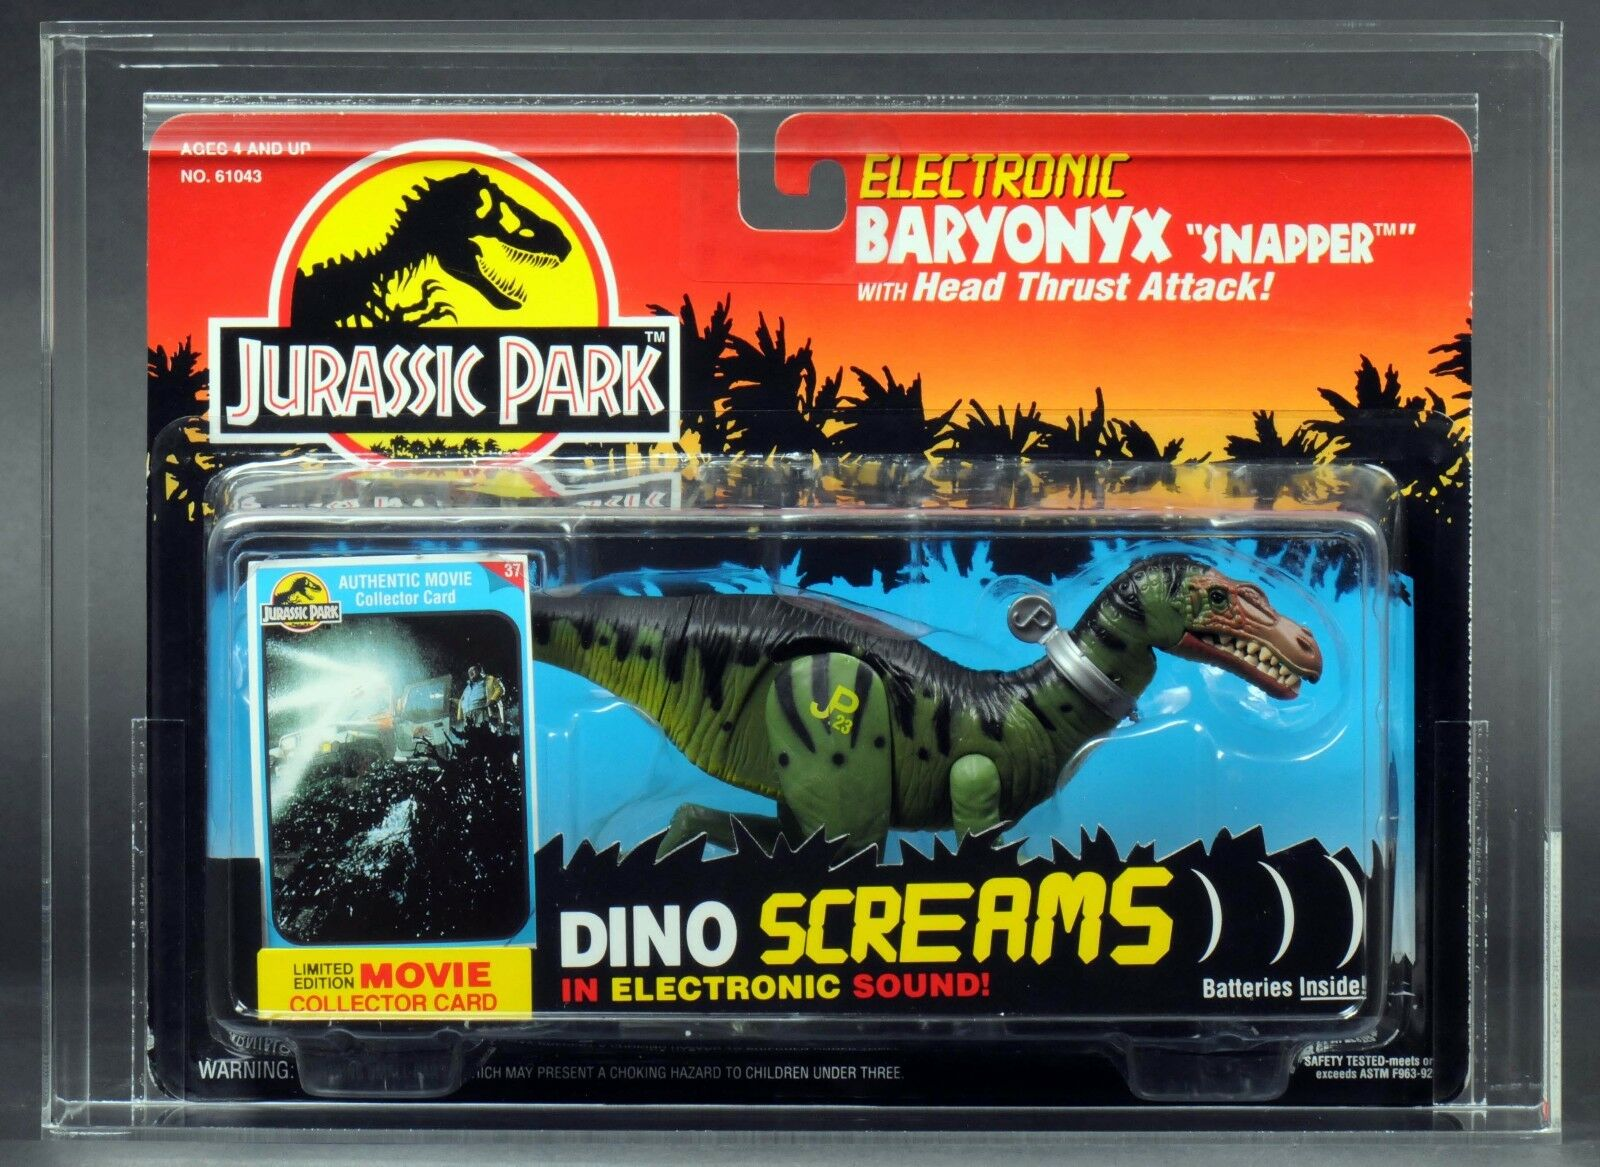 1994 Kenner Jurassic Park Electronic Baryonyx Snapper Series 2 AFA 85 MOC